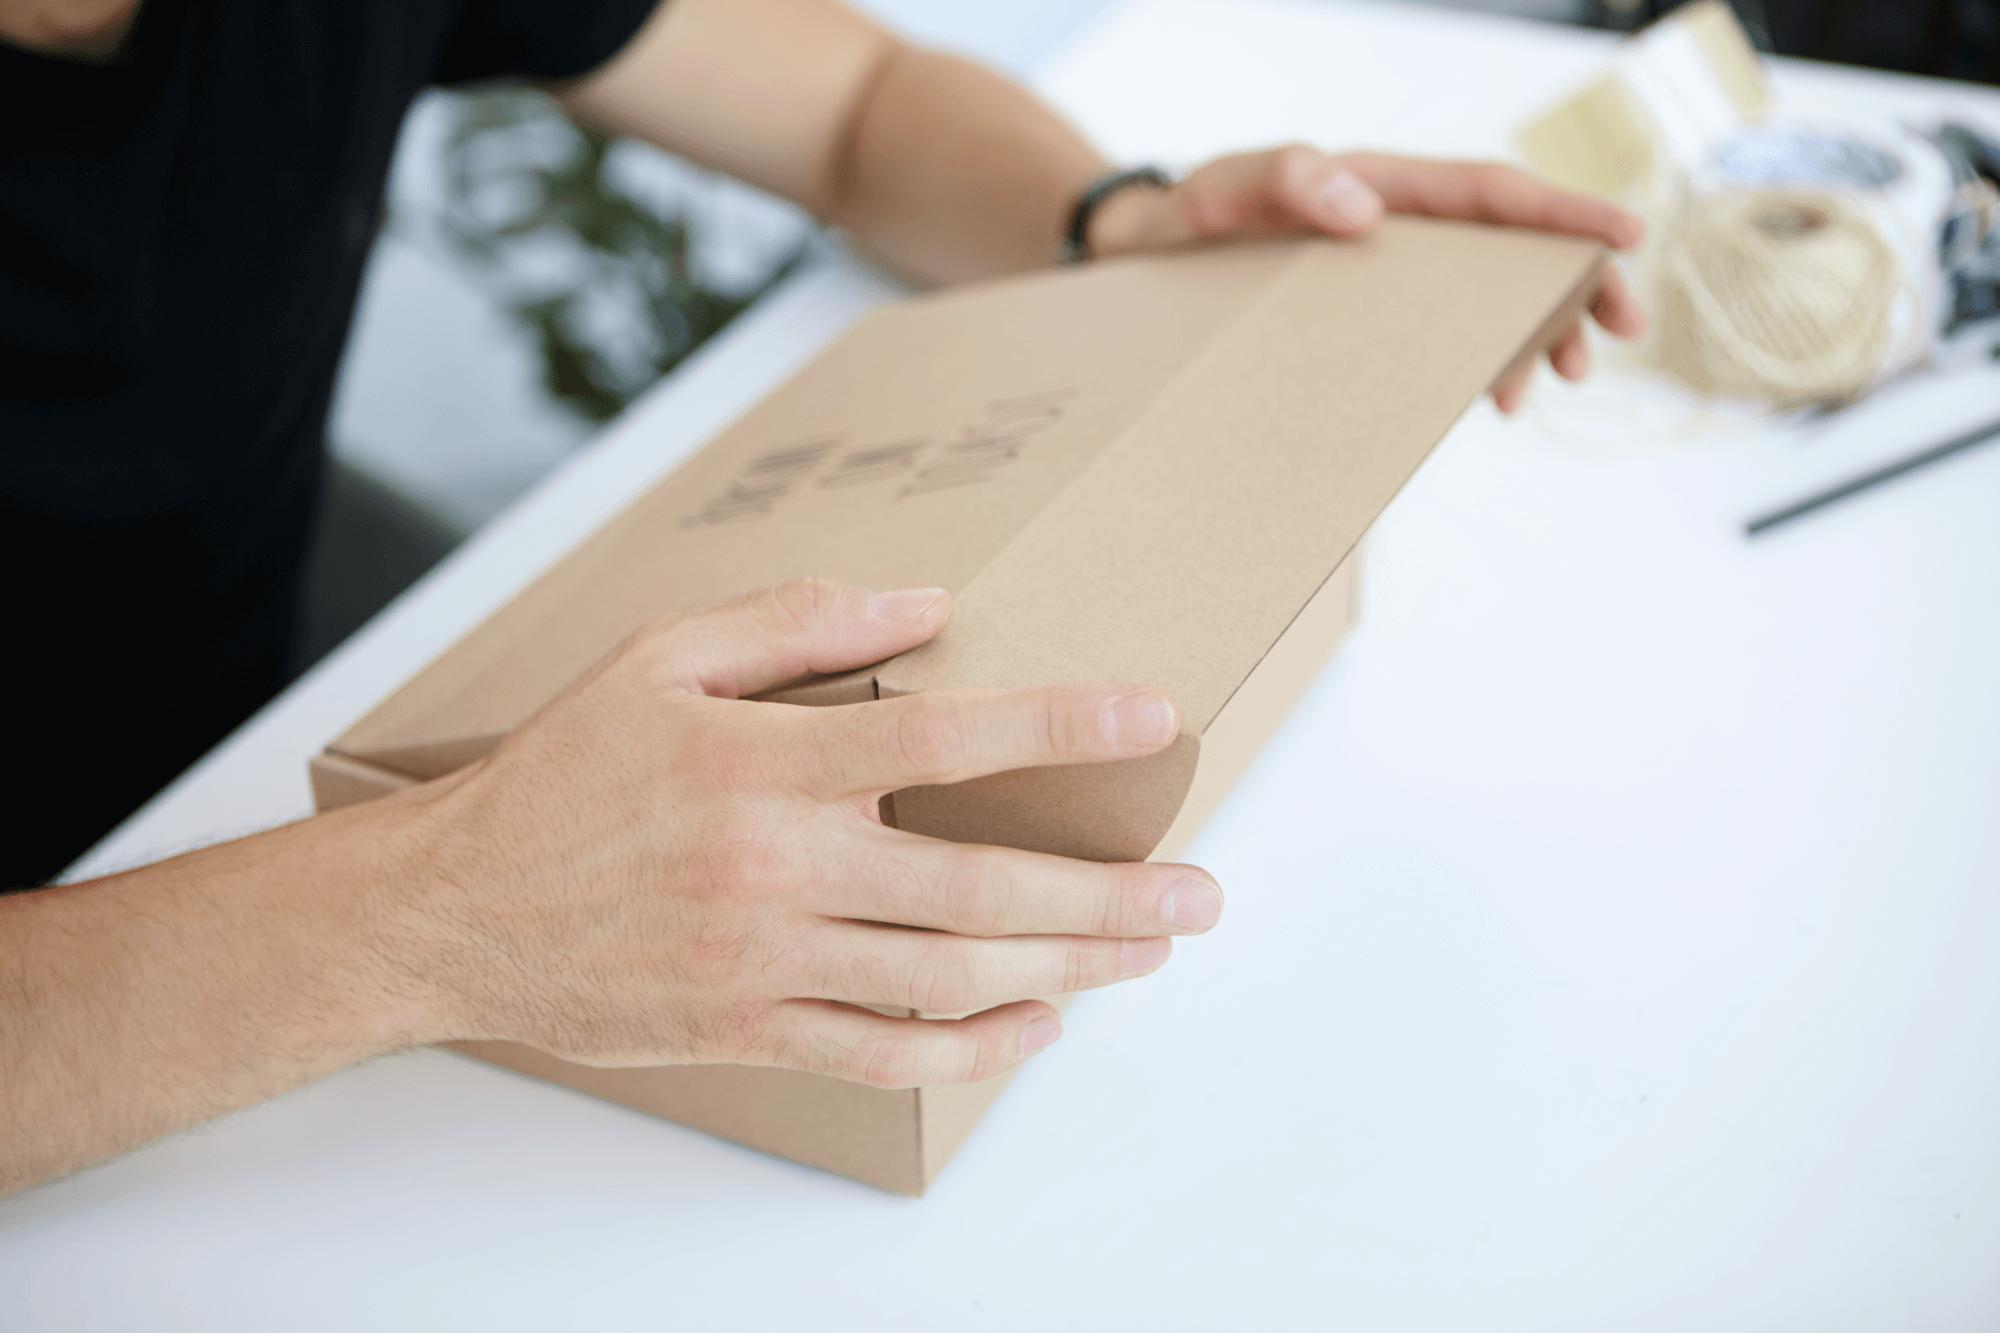 natural cardboard packaging